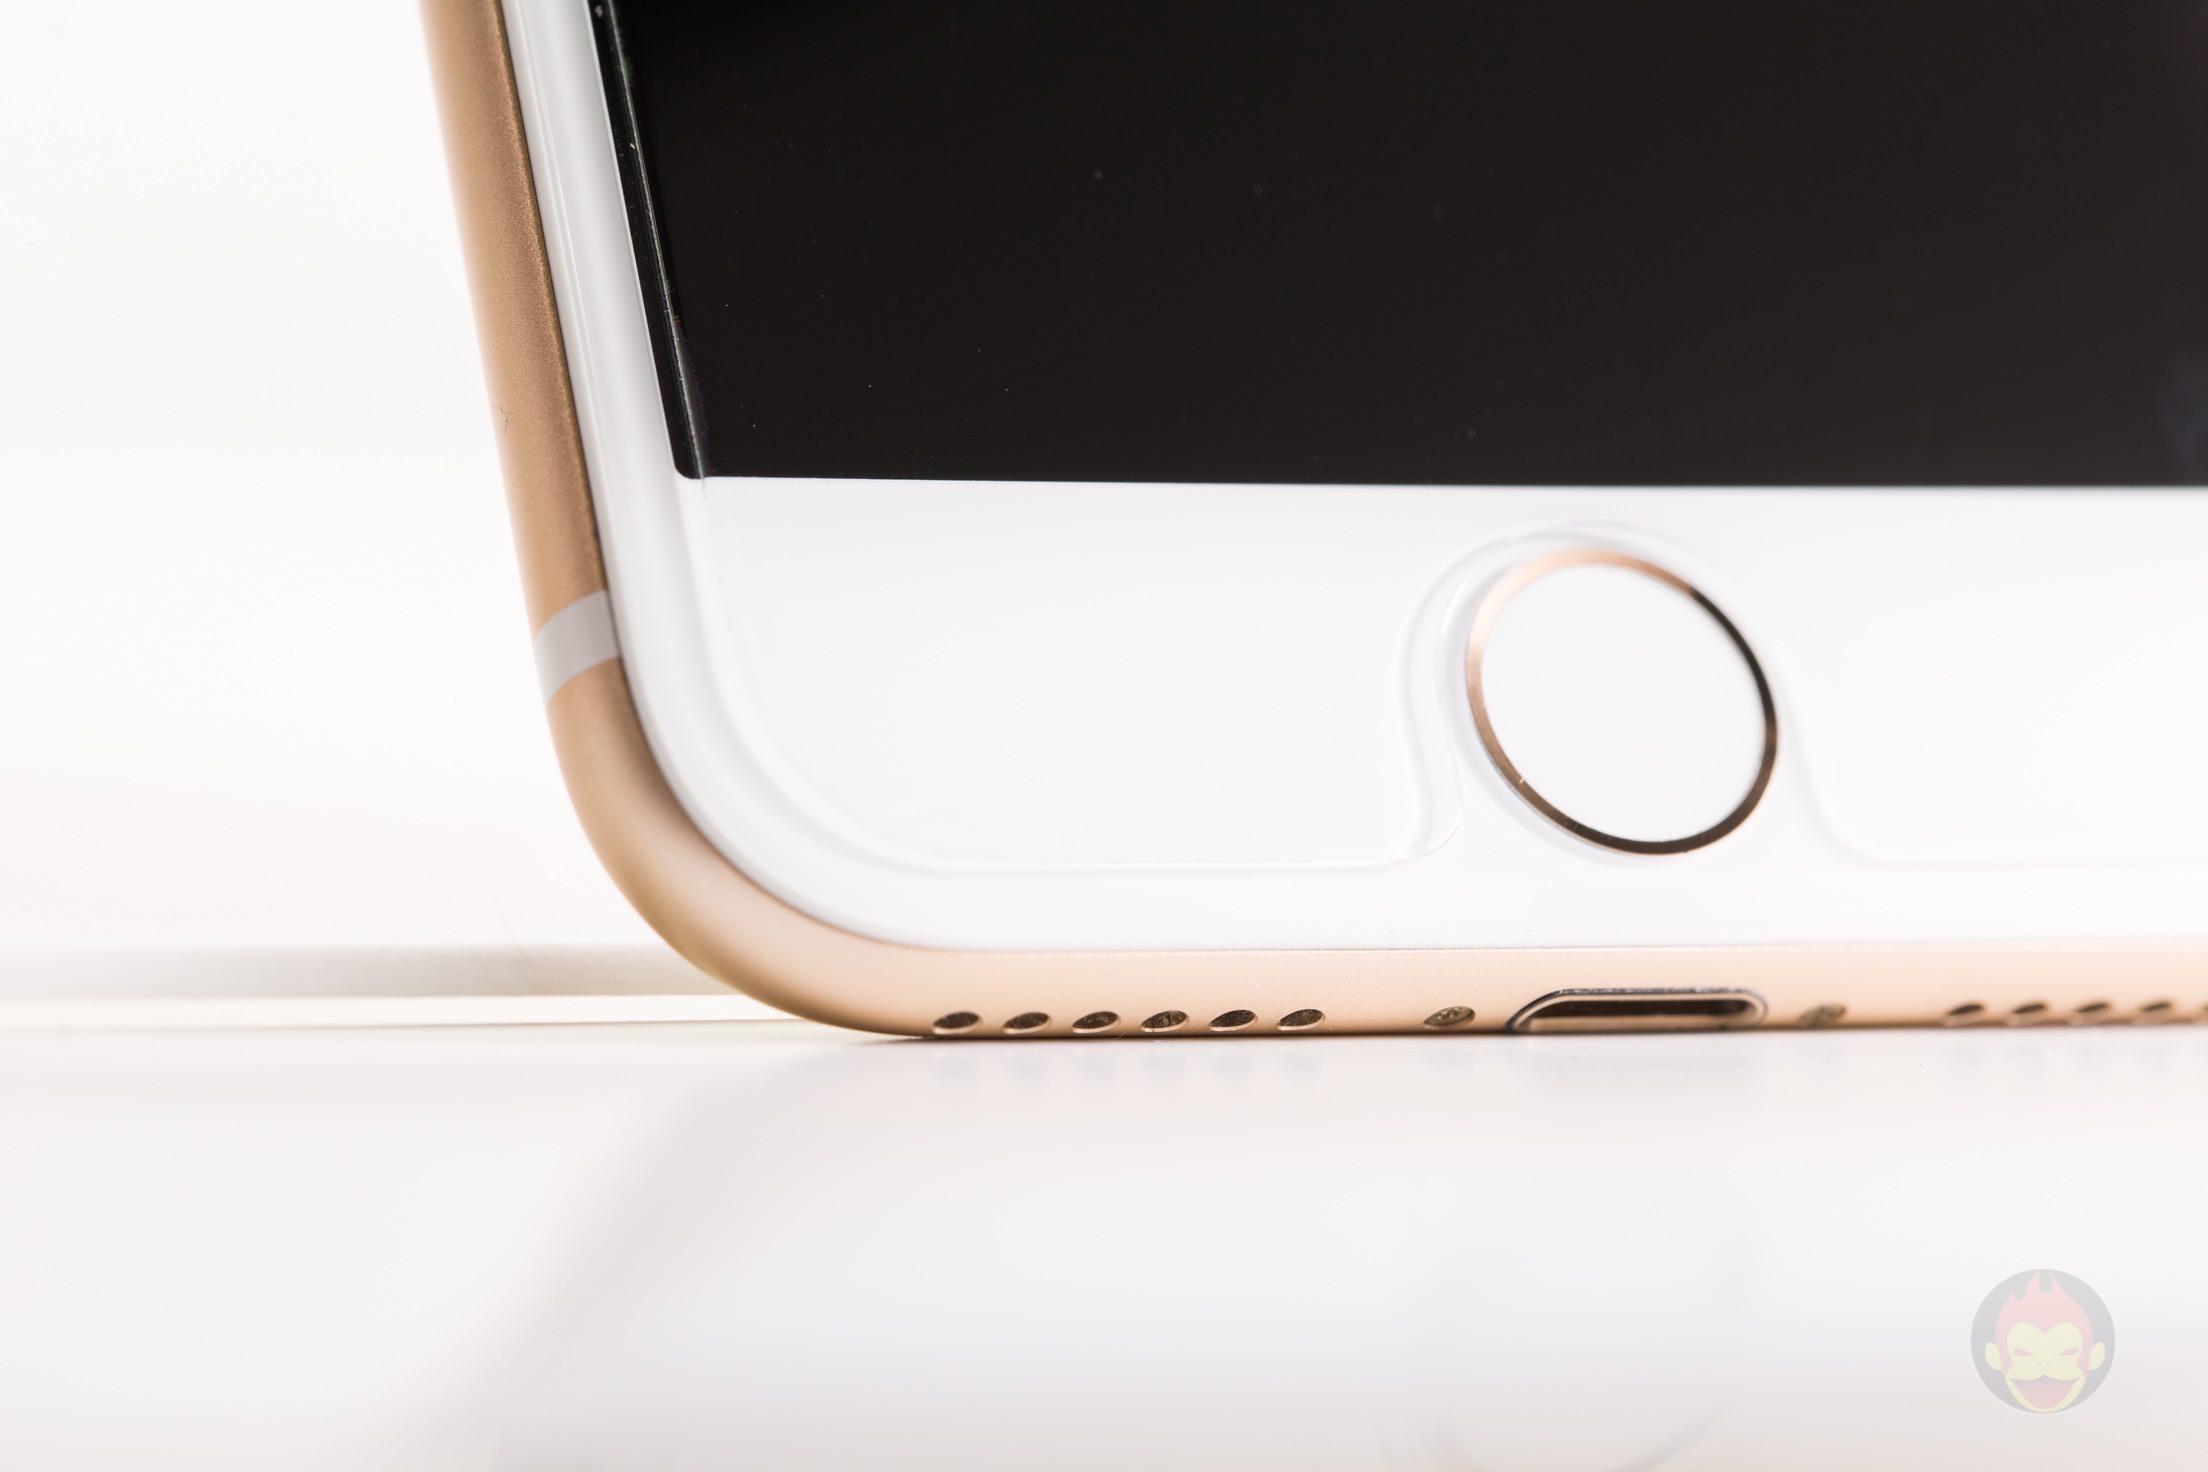 iPhone-7-Gold-Model-11.jpg